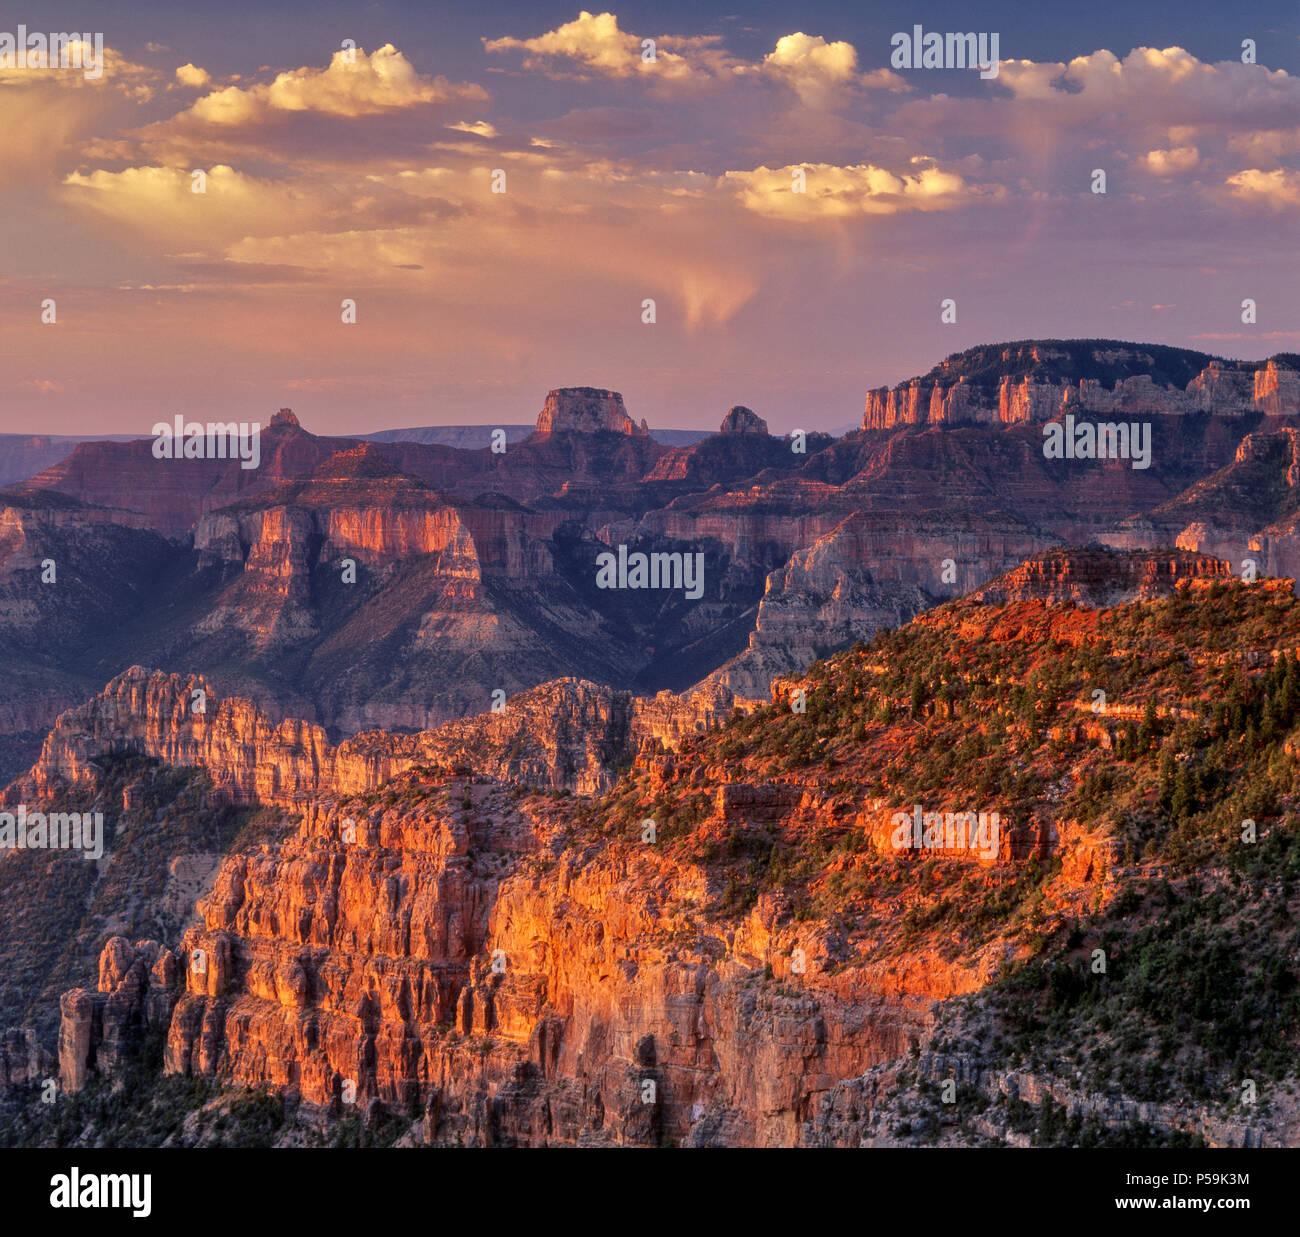 Sunrise, Nankoweap Canyon, il Parco Nazionale del Grand Canyon, Arizona Immagini Stock